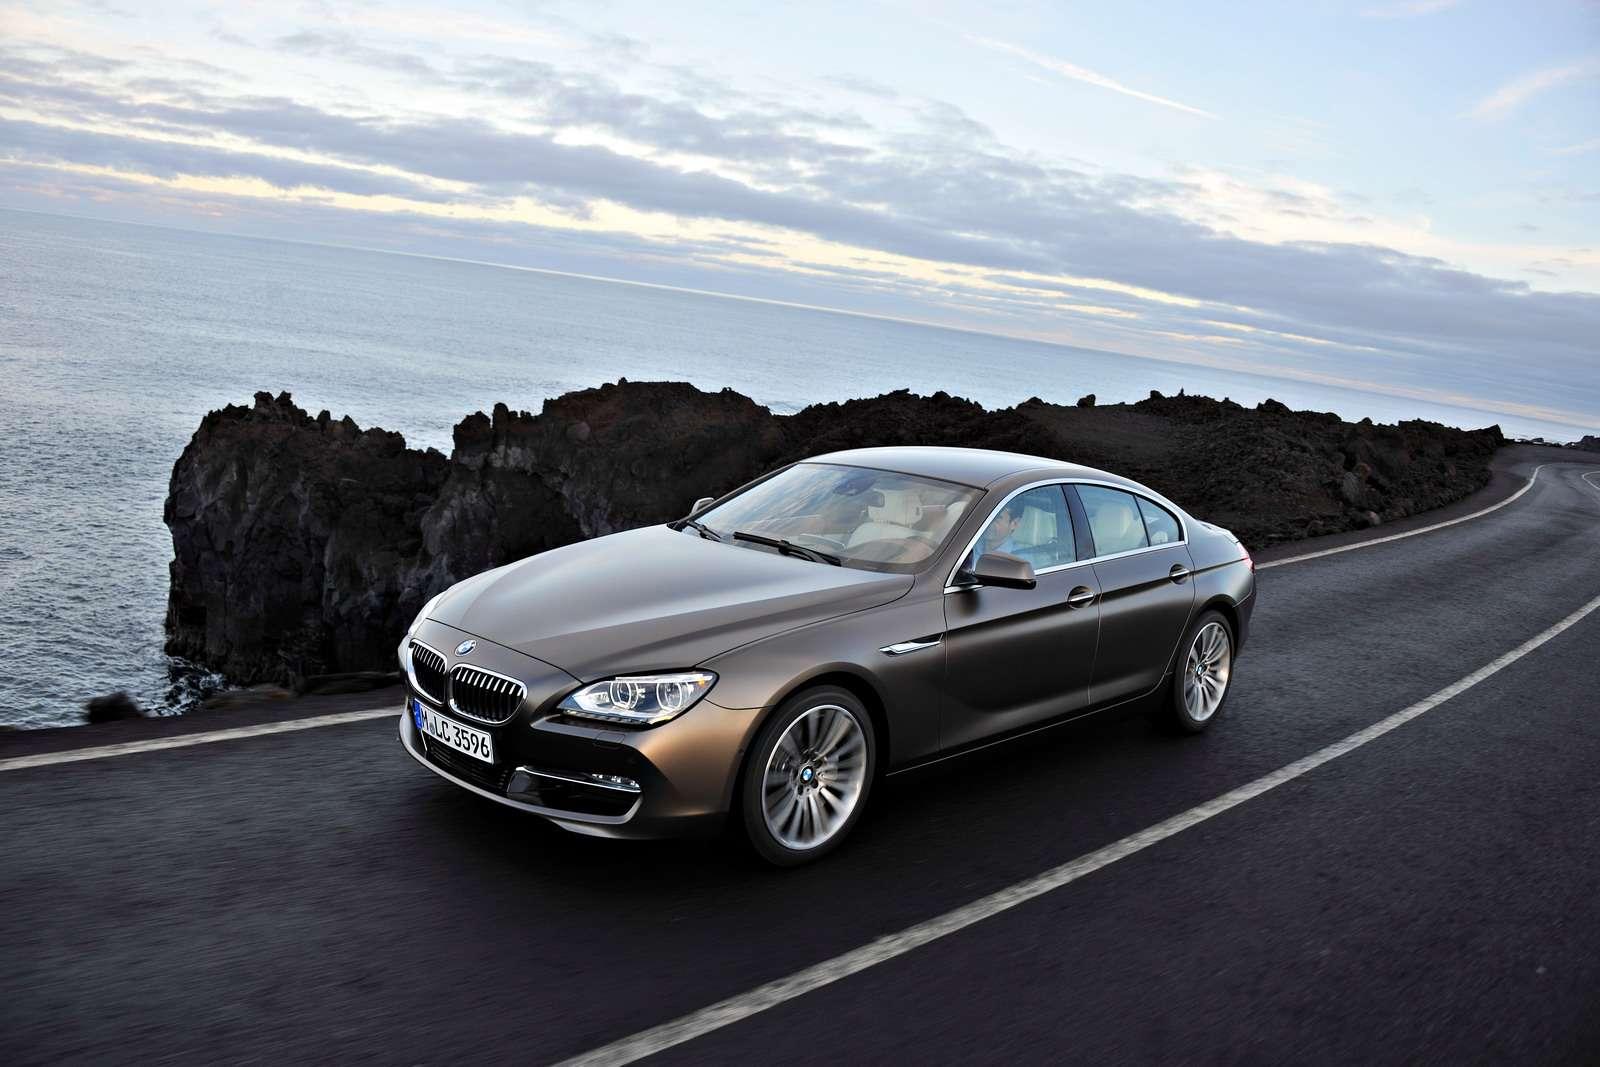 BMW 6 Gran Coupe fot oficjalnie grudzien 2011